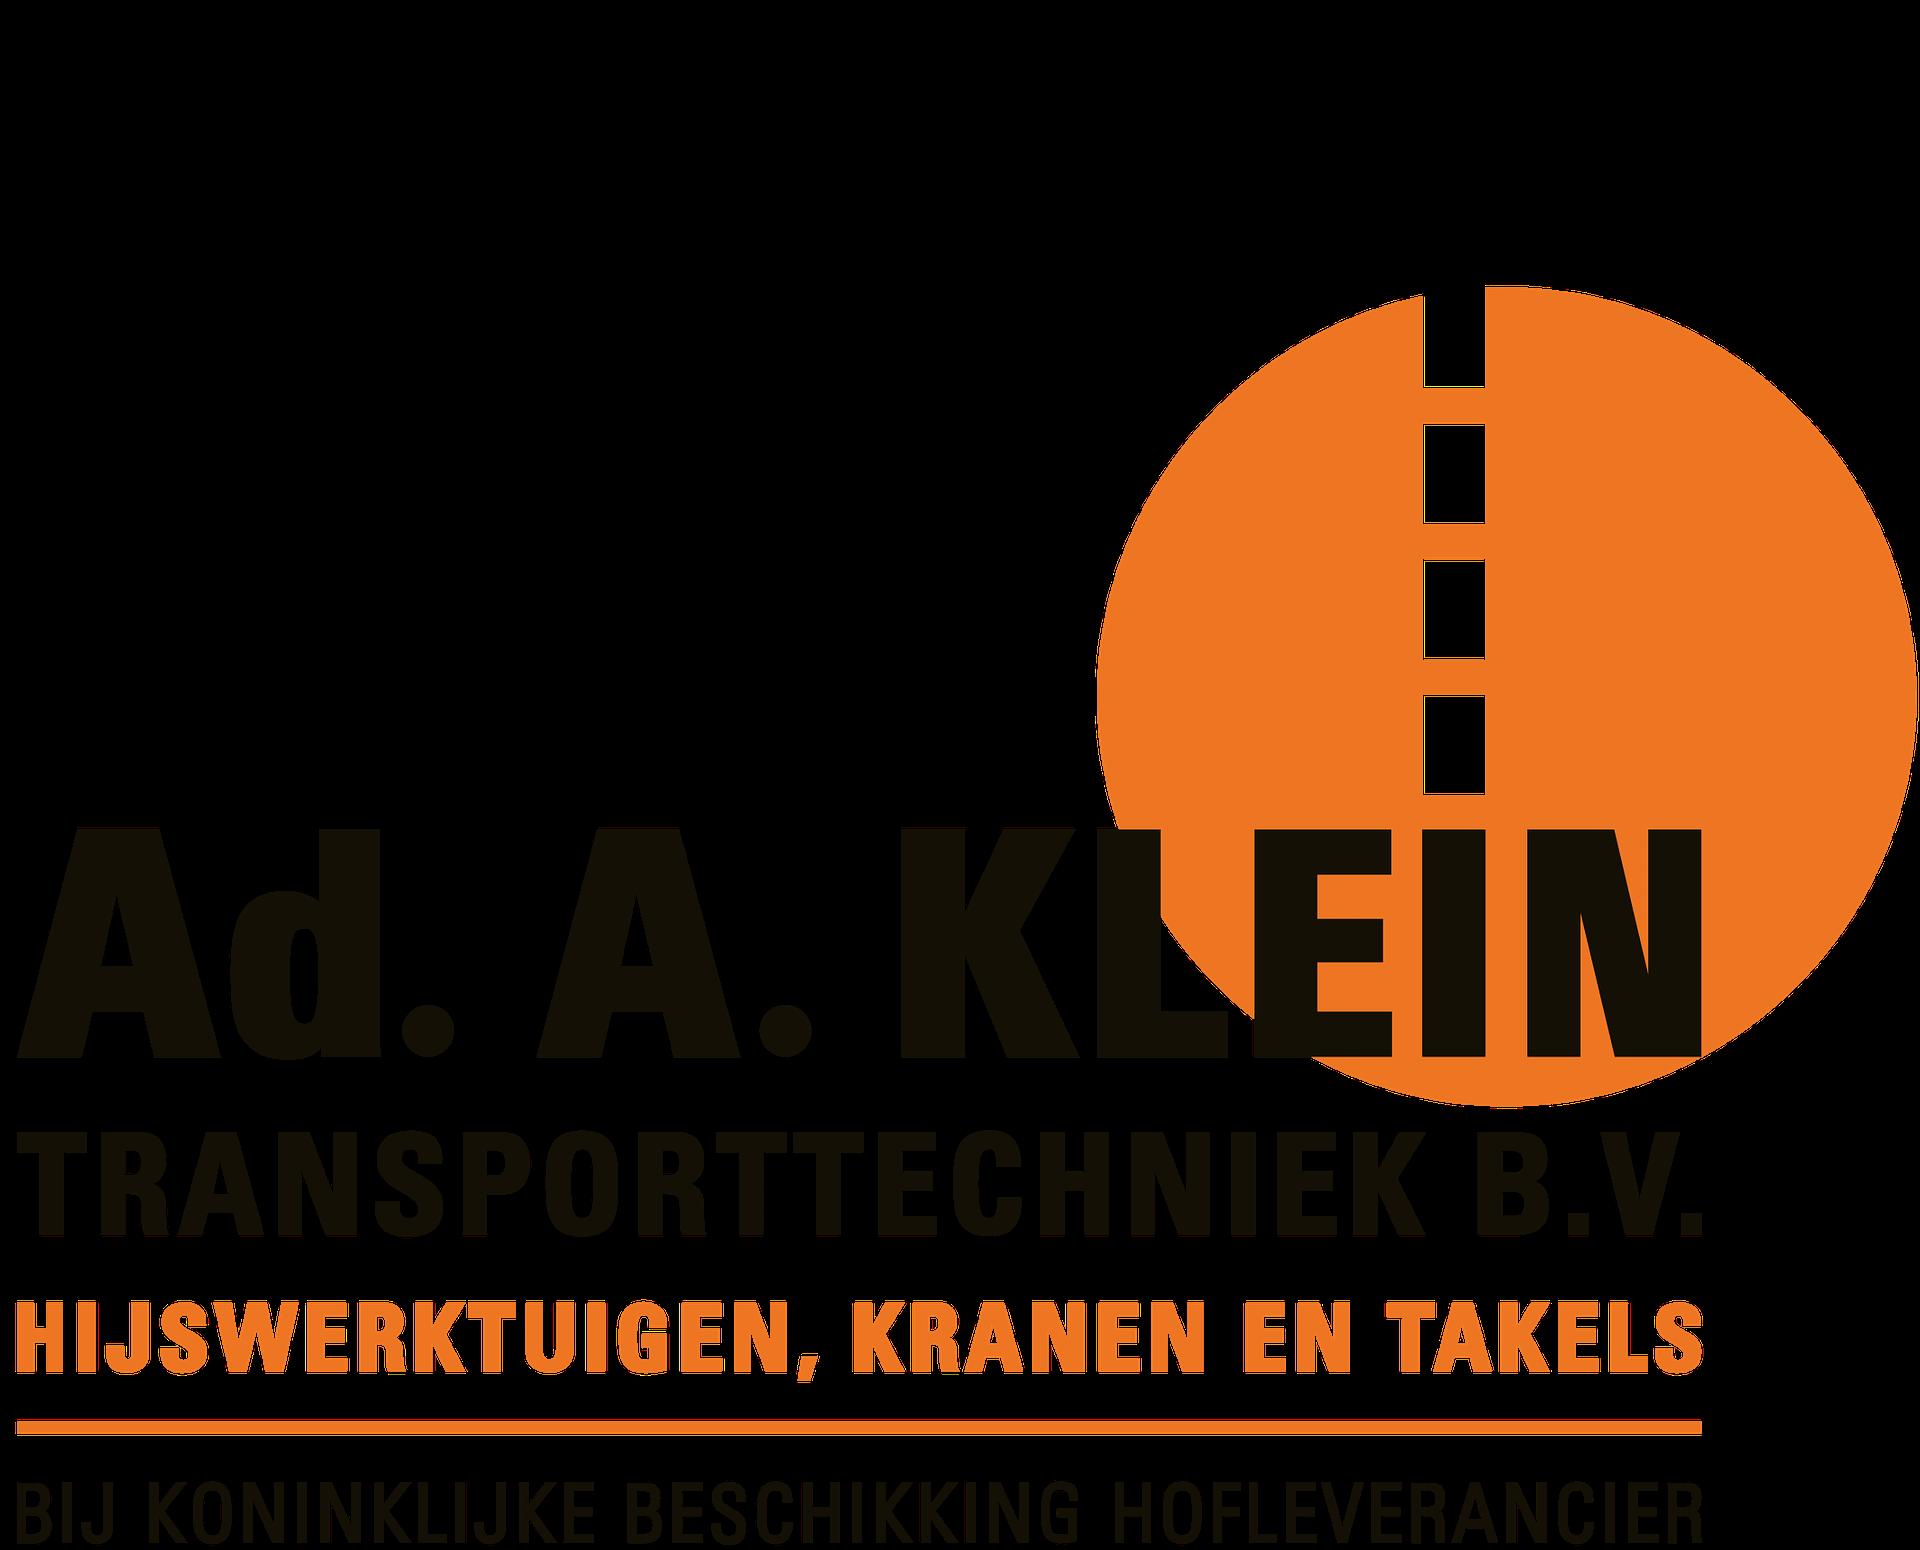 Ad.A. Klein Transporttechniek B.V.